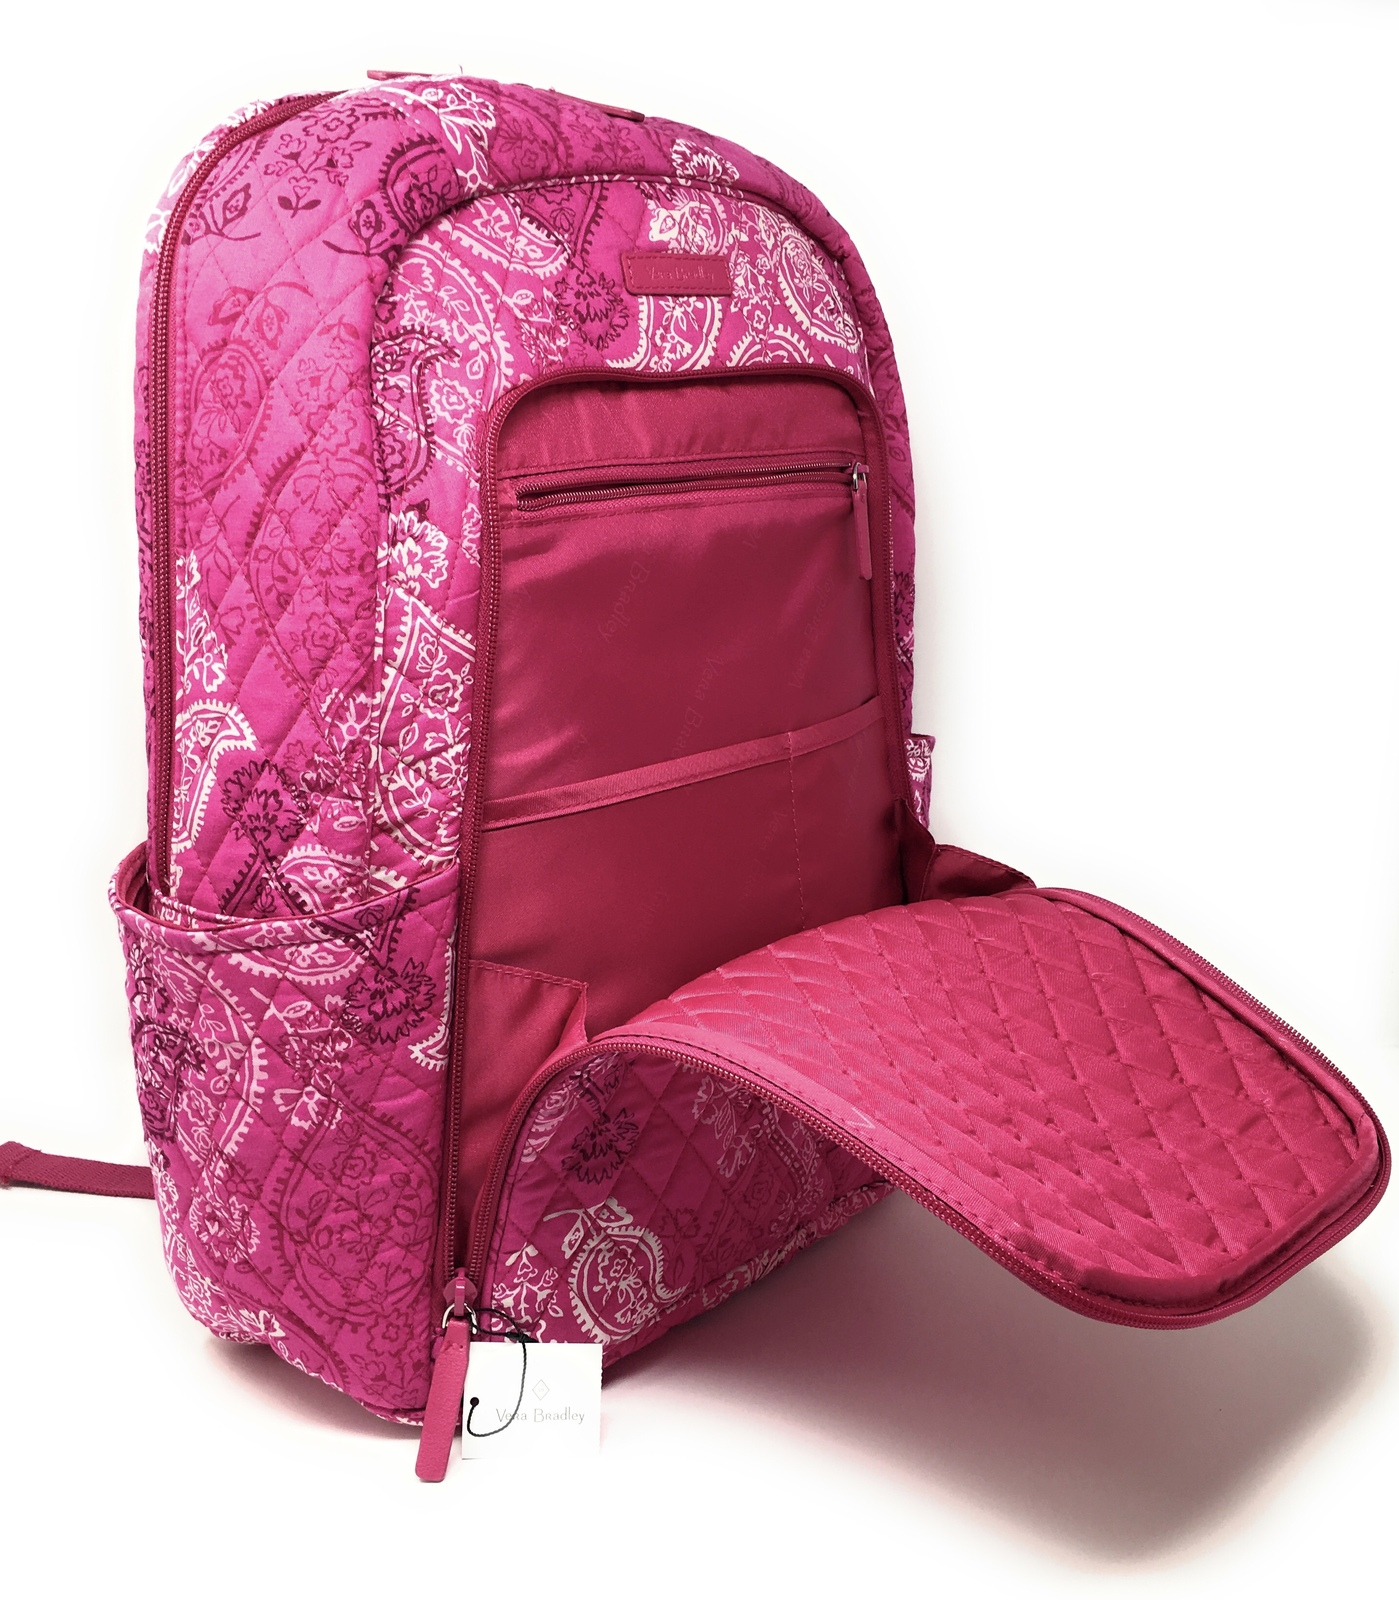 Vera Bradley Laptop Backpack - Stamped Paisley - NWT - $108 MSRP! image 2